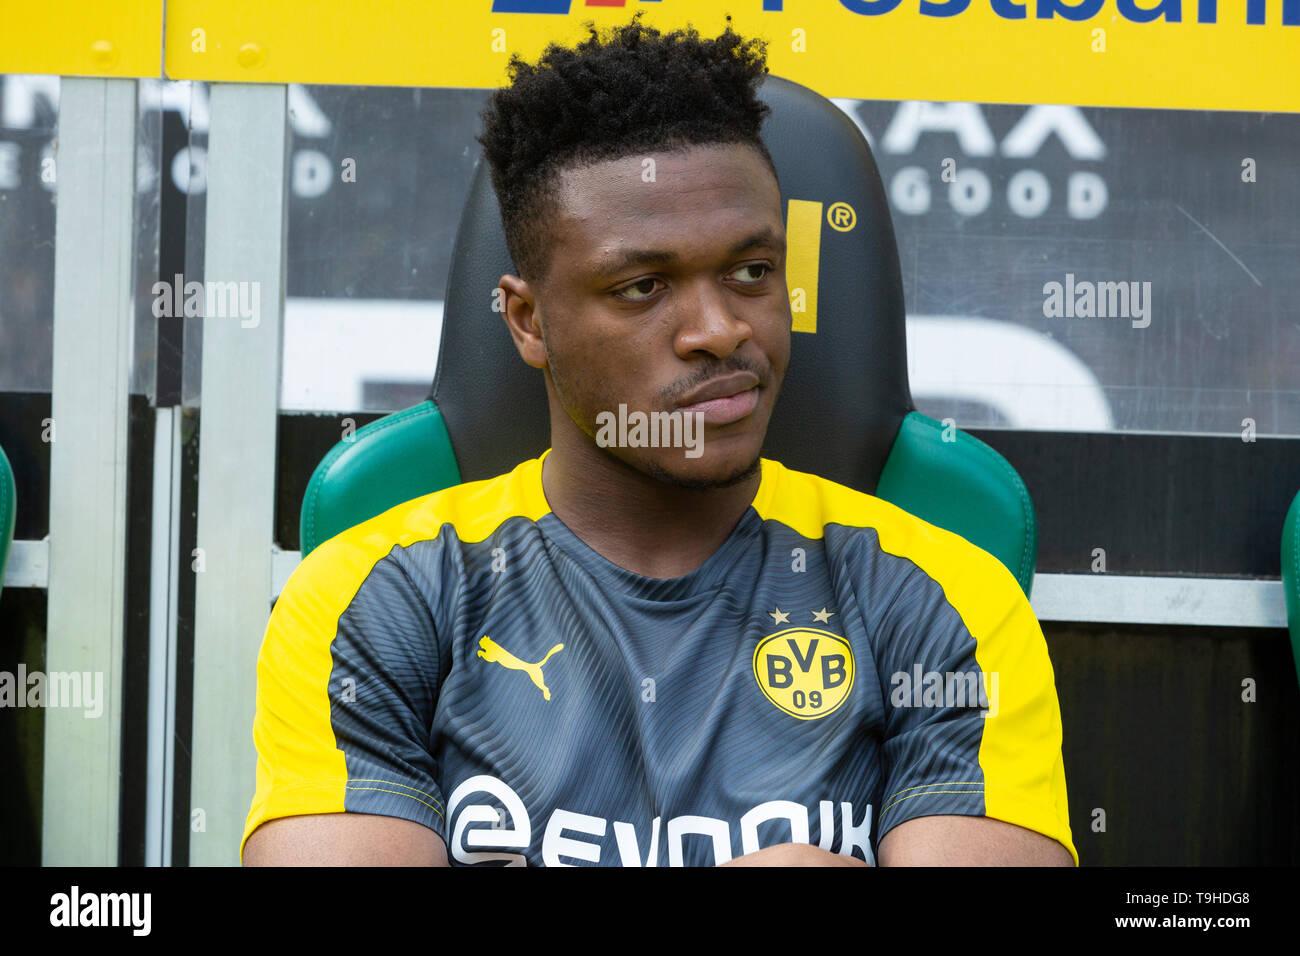 Sport, Fussball, Bundesliga, 2018/2019, Borussia Moenchengladbach vs. BVB Borussia Dortmund 0-2, Stadion Borussia-Park, Spielerbank, Dan-Axel Zagadou (BVB), DFL REGULATIONS PROHIBIT ANY USE OF PHOTOGRAPHS AS IMAGE SEQUENCES AND/OR QUASI-VIDEO, sports, football, Bundesliga, 2018/2019, Borussia Moenchengladbach vs. BVB Borussia Dortmund 0-2, Stadium Borussia Park, players bench, Dan Axel Zagadou (BVB), DFL REGULATIONS PROHIBIT ANY USE OF PHOTOGRAPHS AS IMAGE SEQUENCES AND/OR QUASI-VIDEO *** Local Caption *** sports, football, Bundesliga, 2018/2019, Borussia Moenchengladbach vs. BVB Borussia Dort - Stock Image